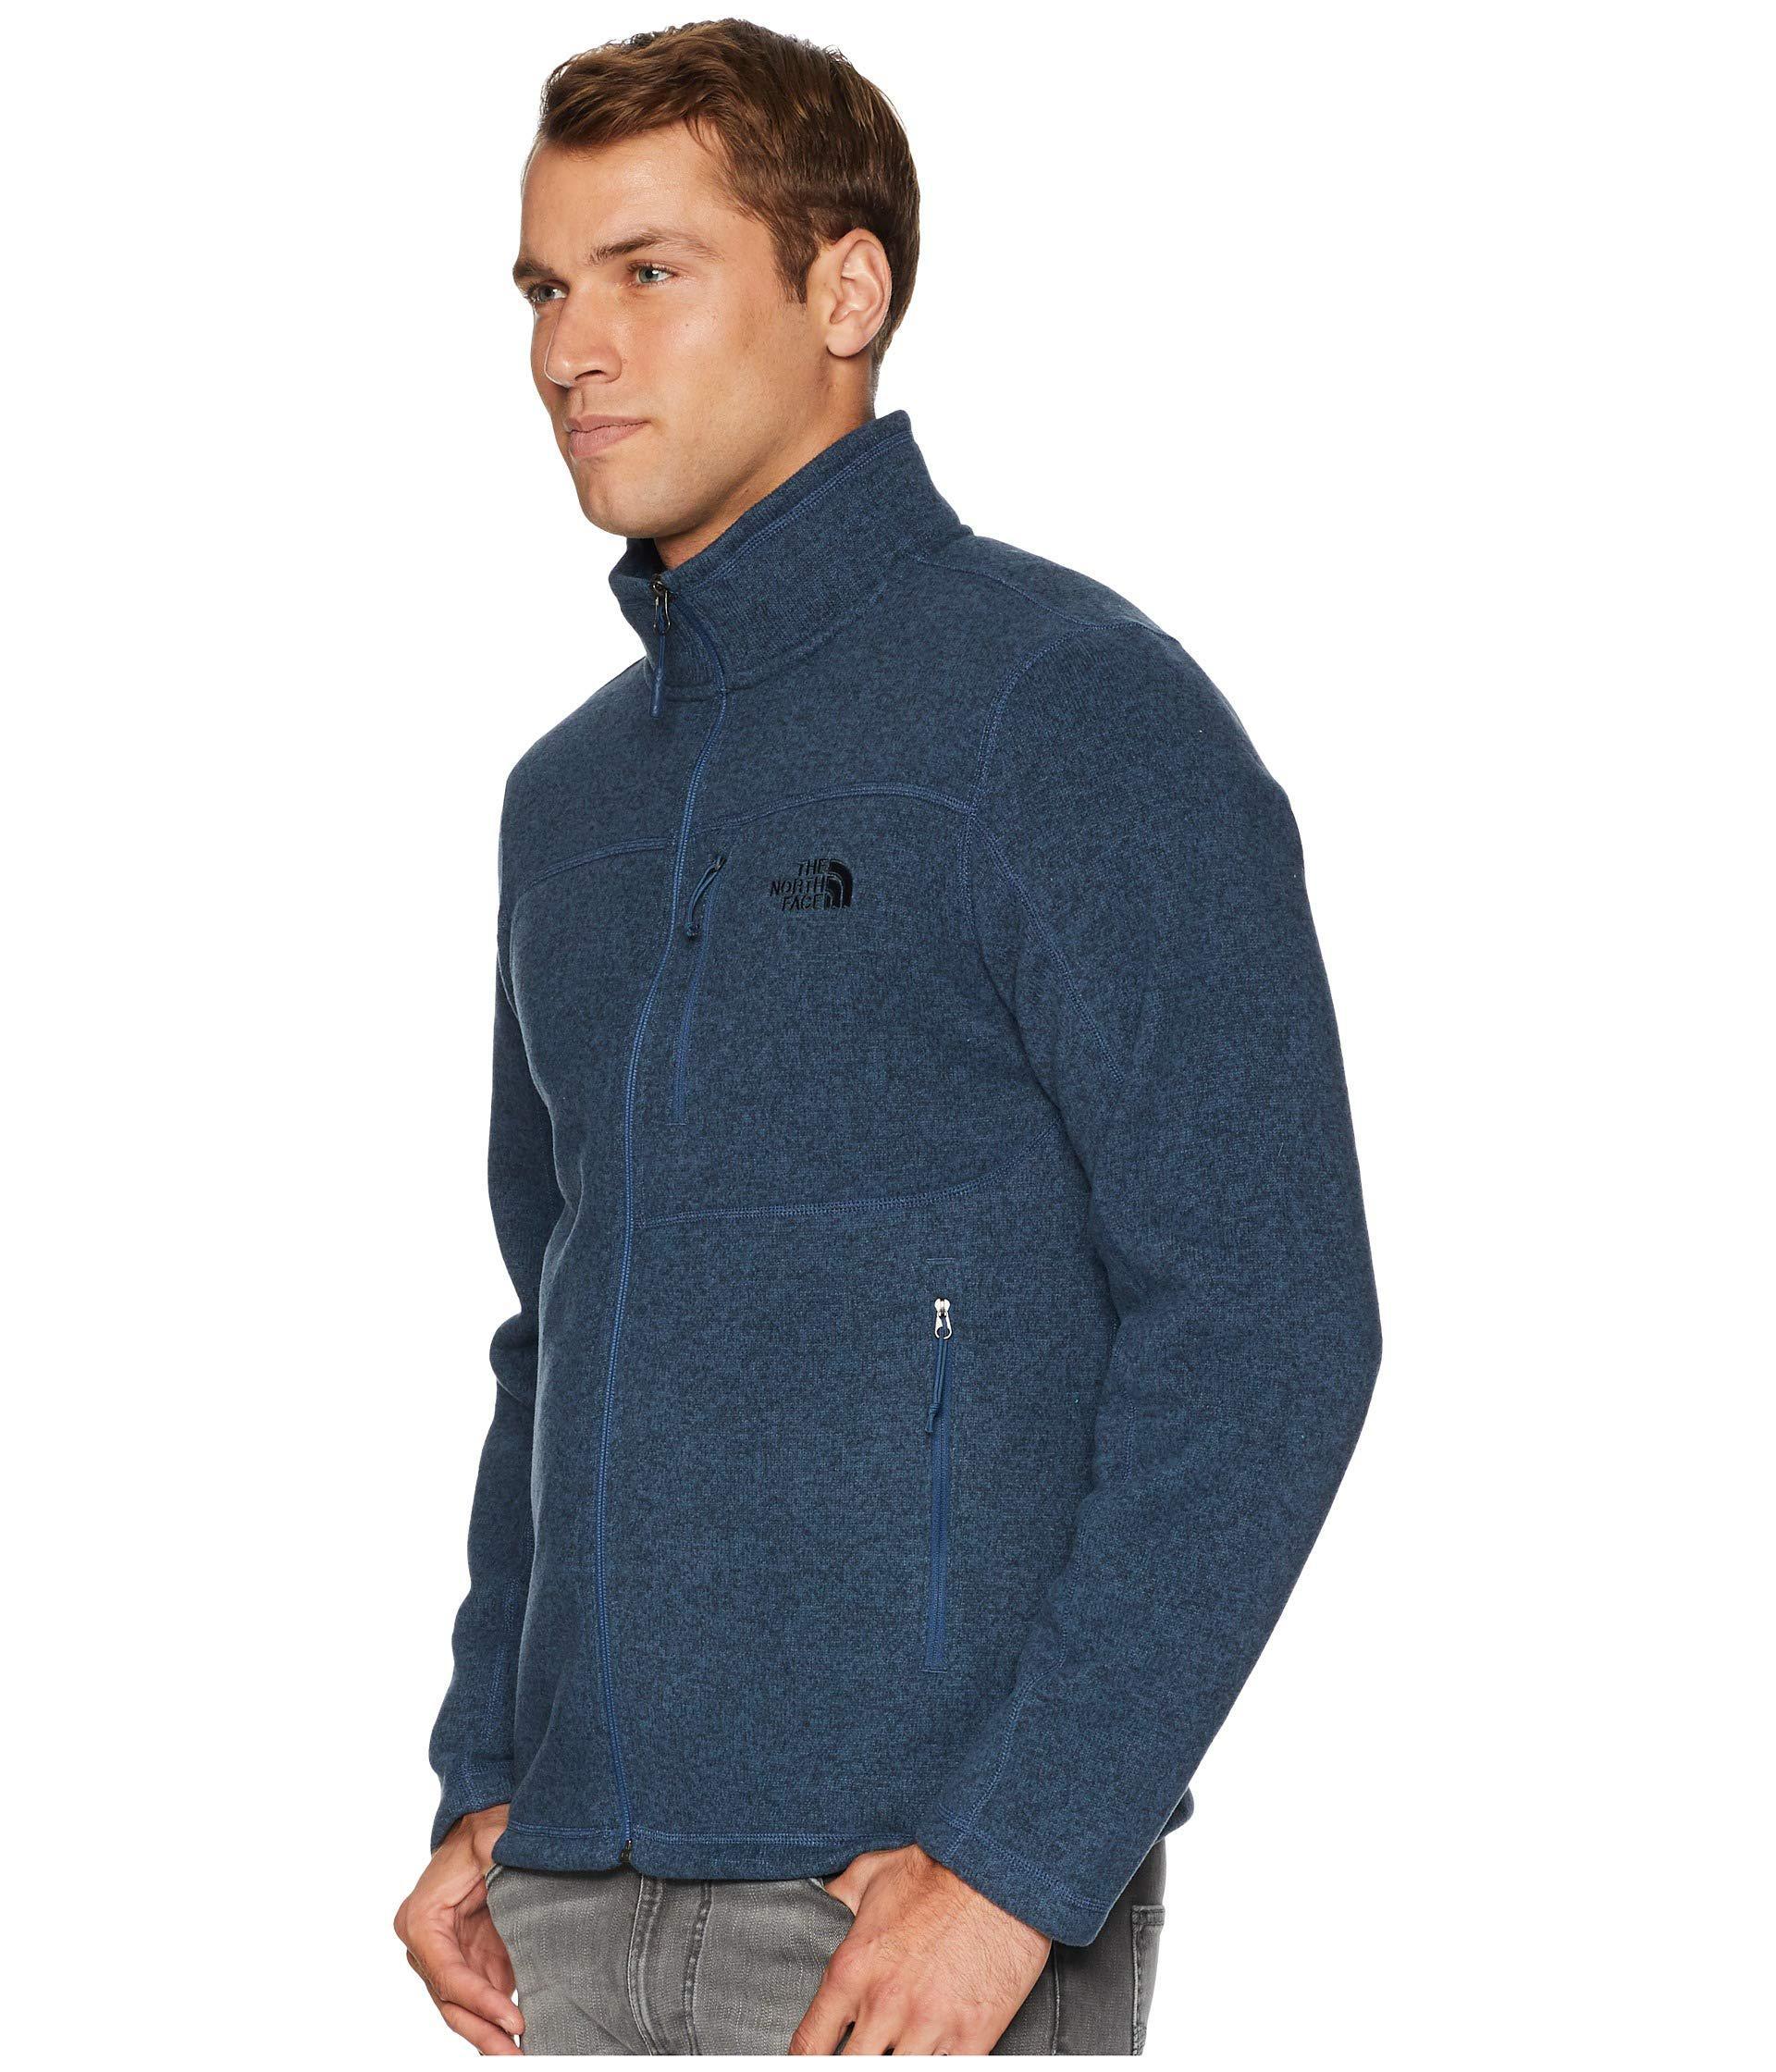 cfd870f34 The North Face Blue Gordon Lyons Full Zip (tnf Medium Grey Heather) Men's  Jacket for men